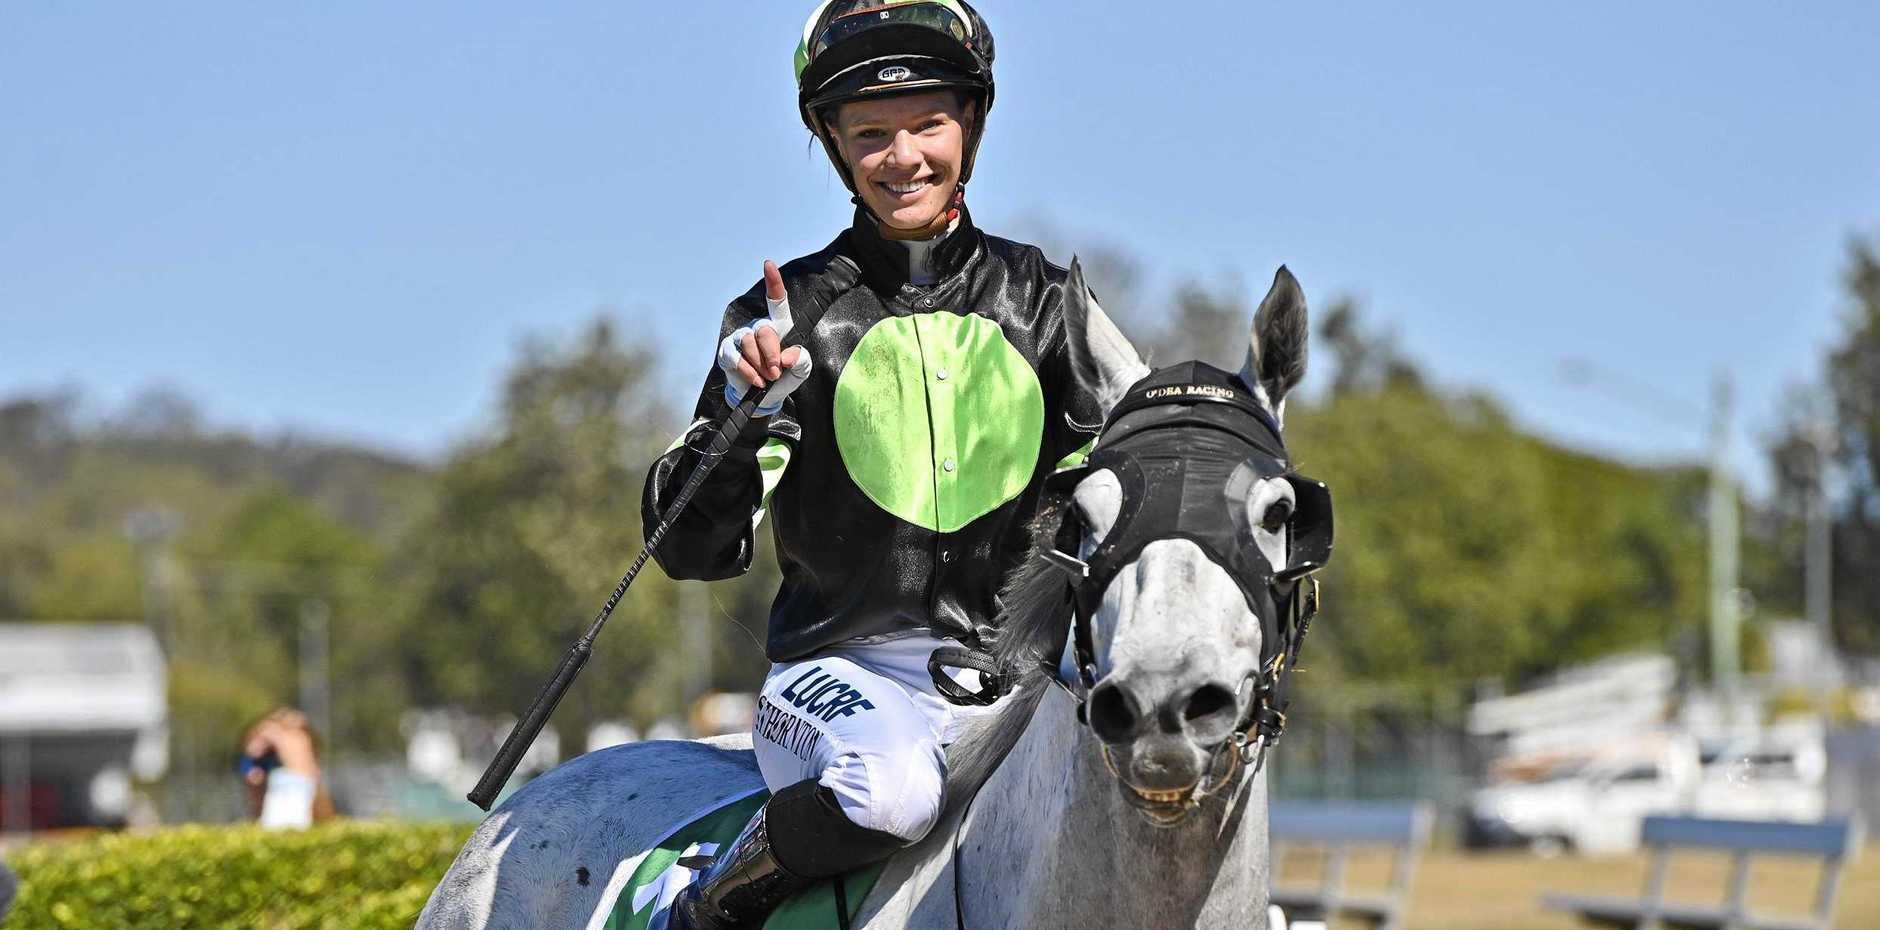 Jockey Stephanie Thornton enjoys her win aboard So Spirited.